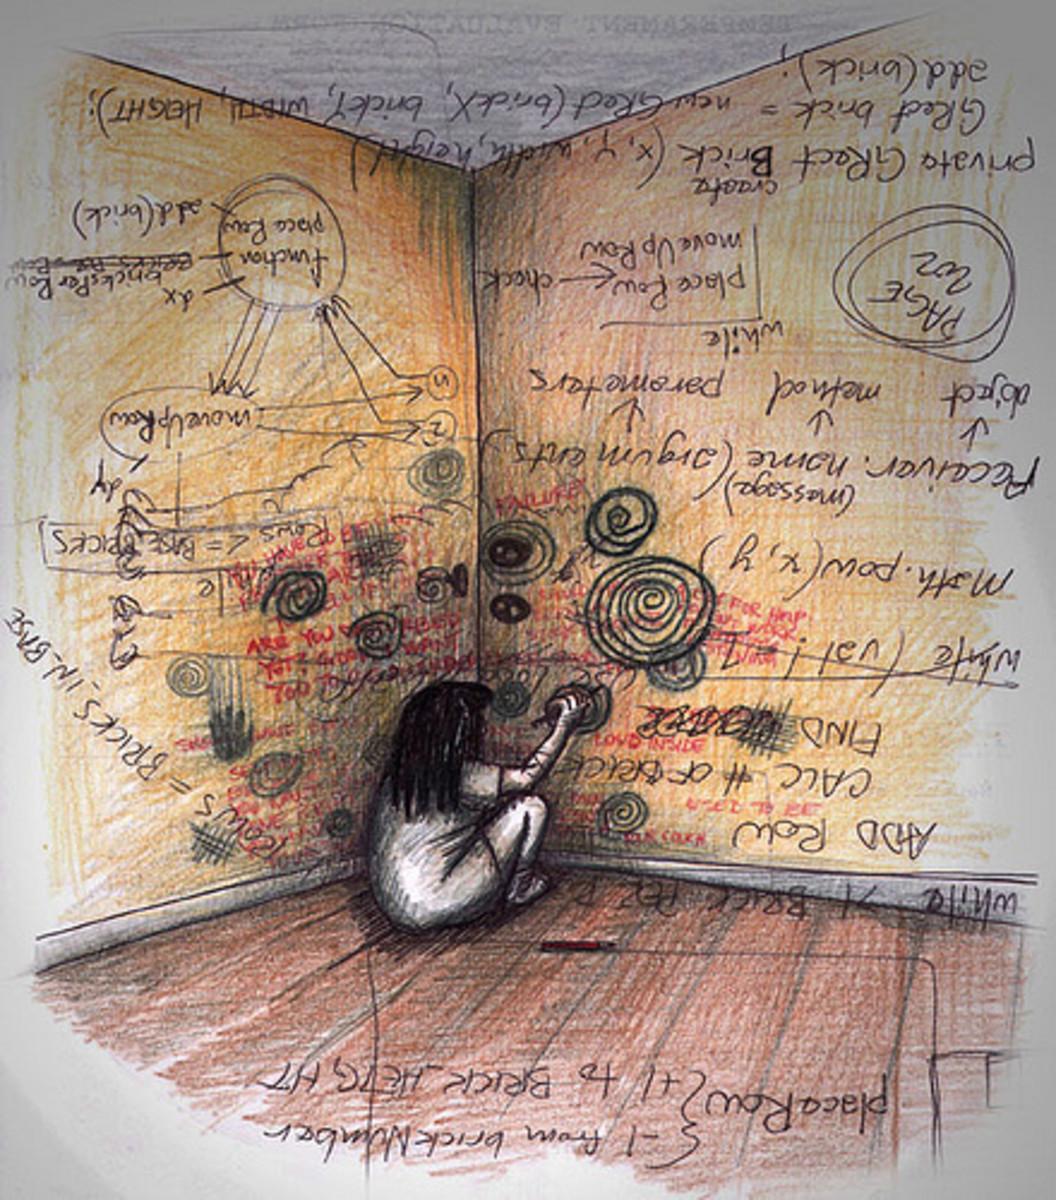 a-short-history-of-mental-illness-treatment